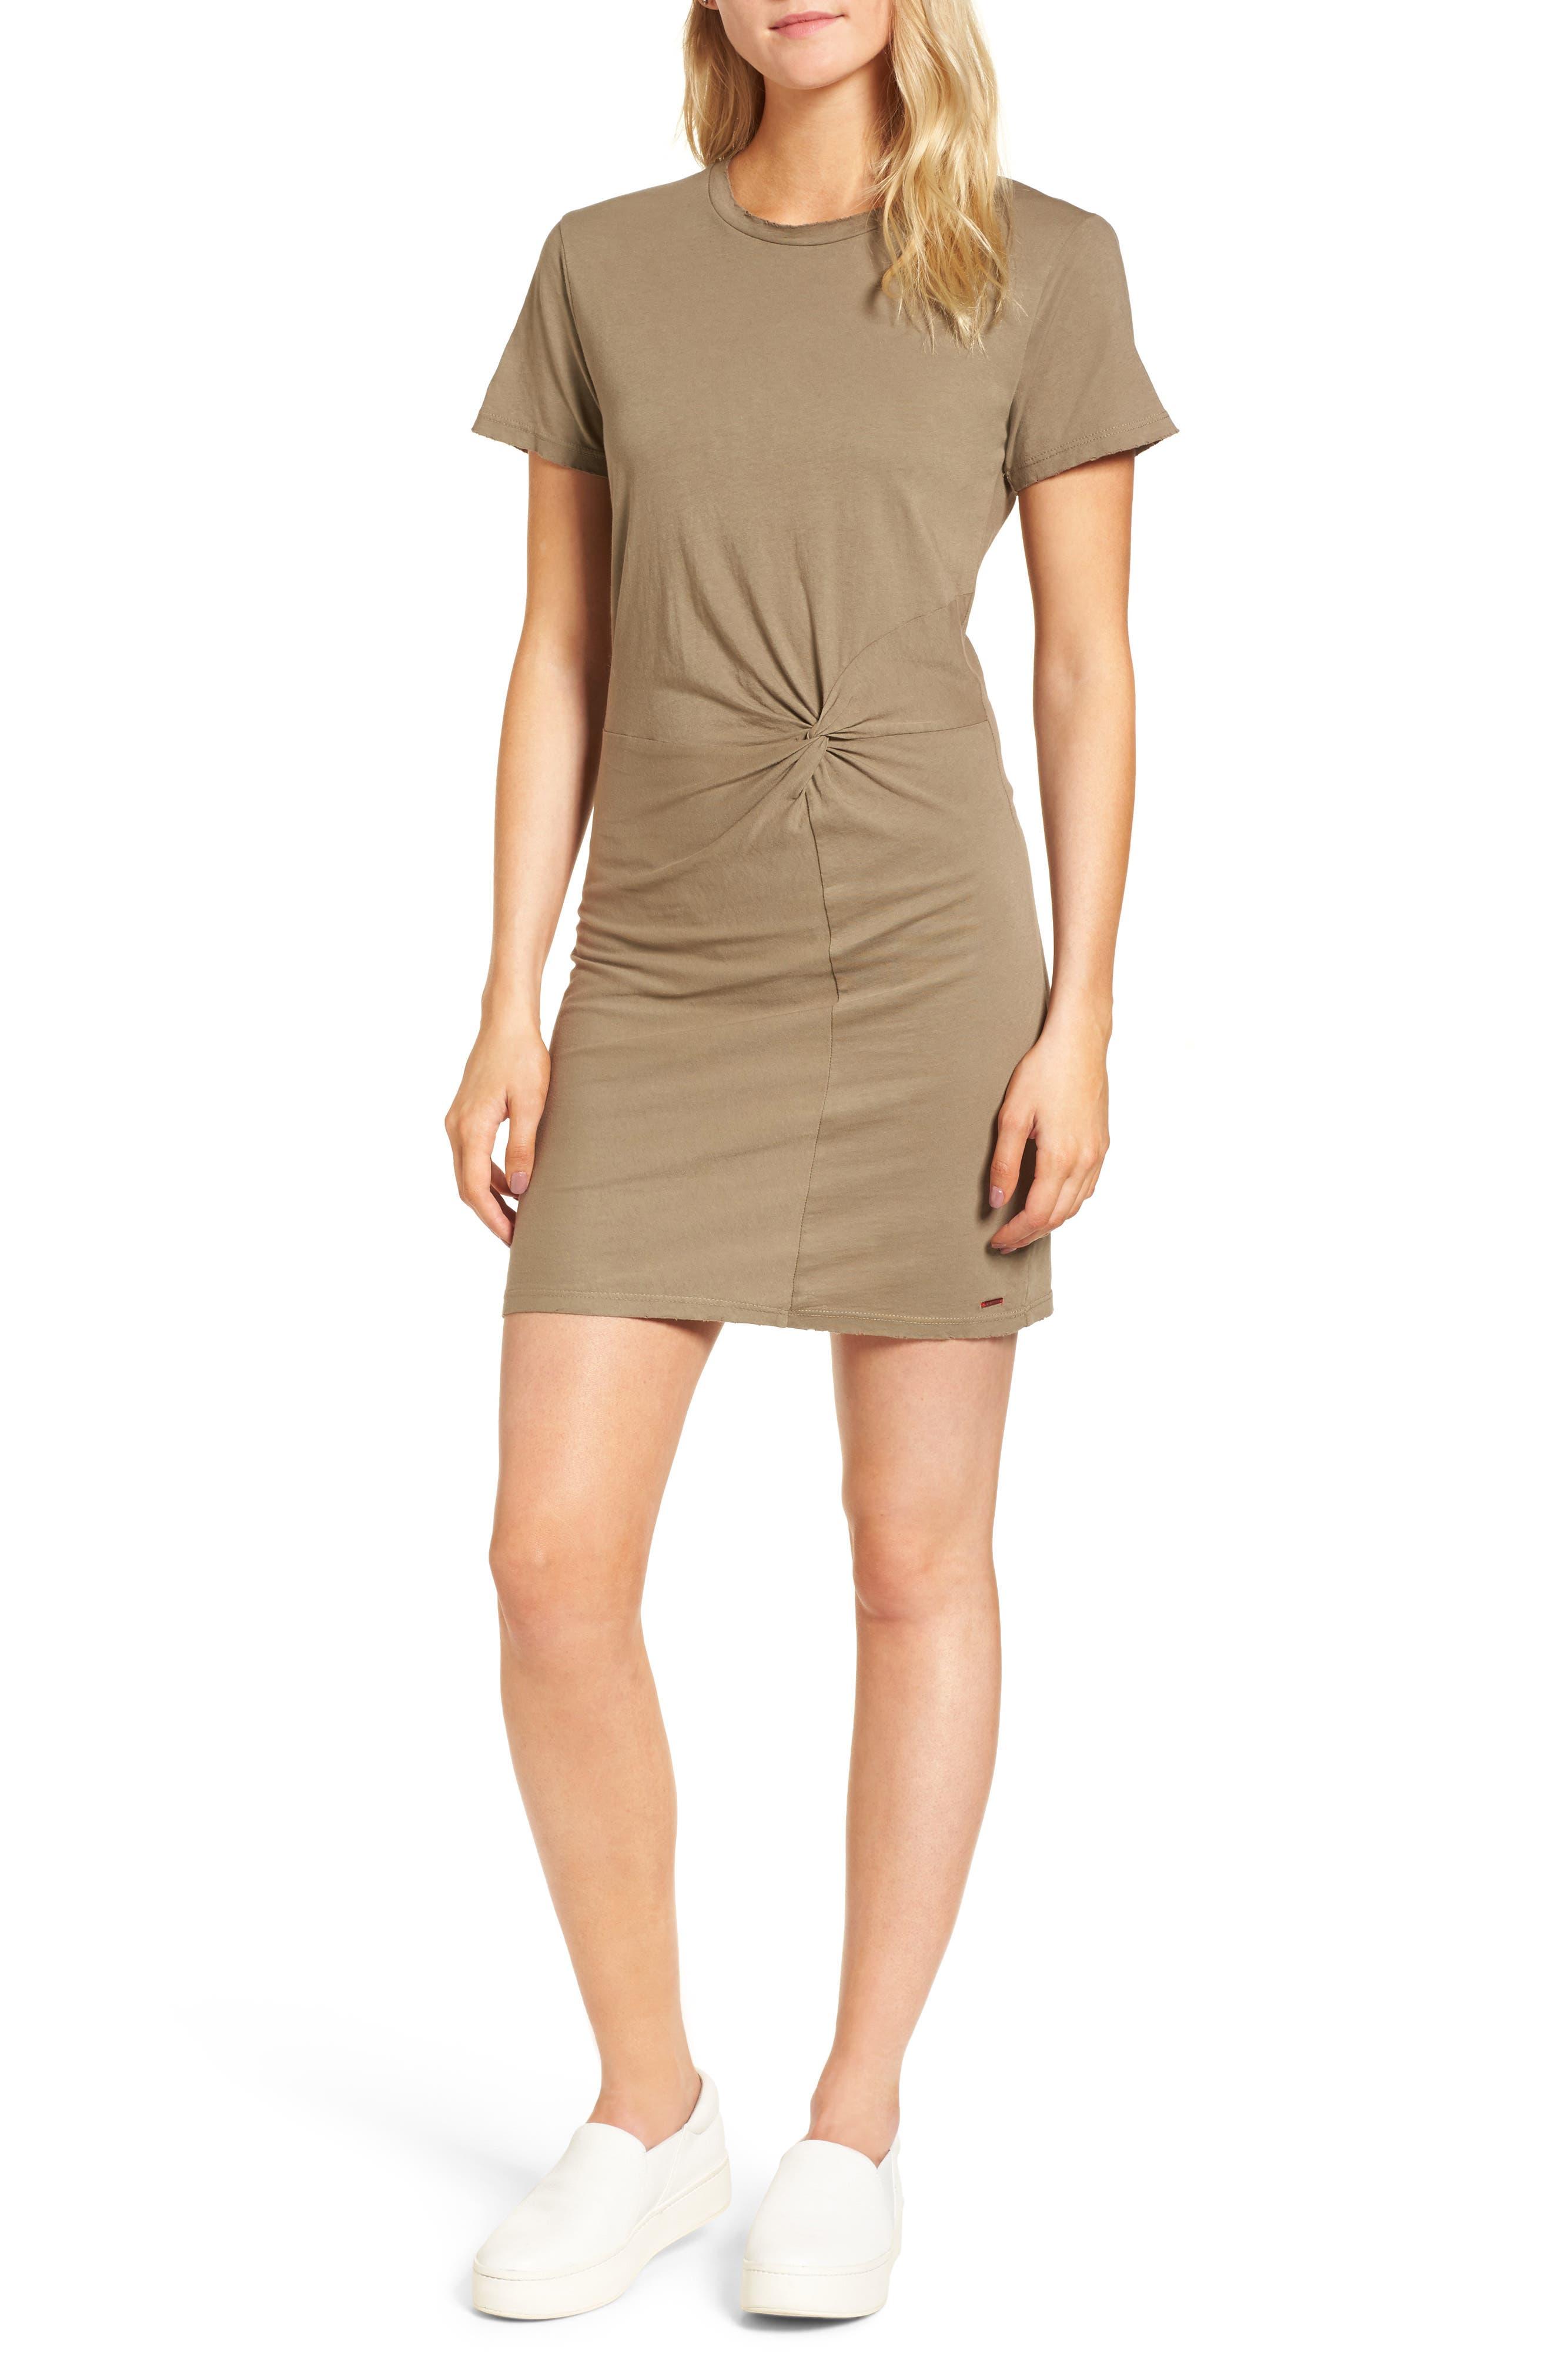 n:PHILANTHROPY Jazz Knotted T-Shirt Dress